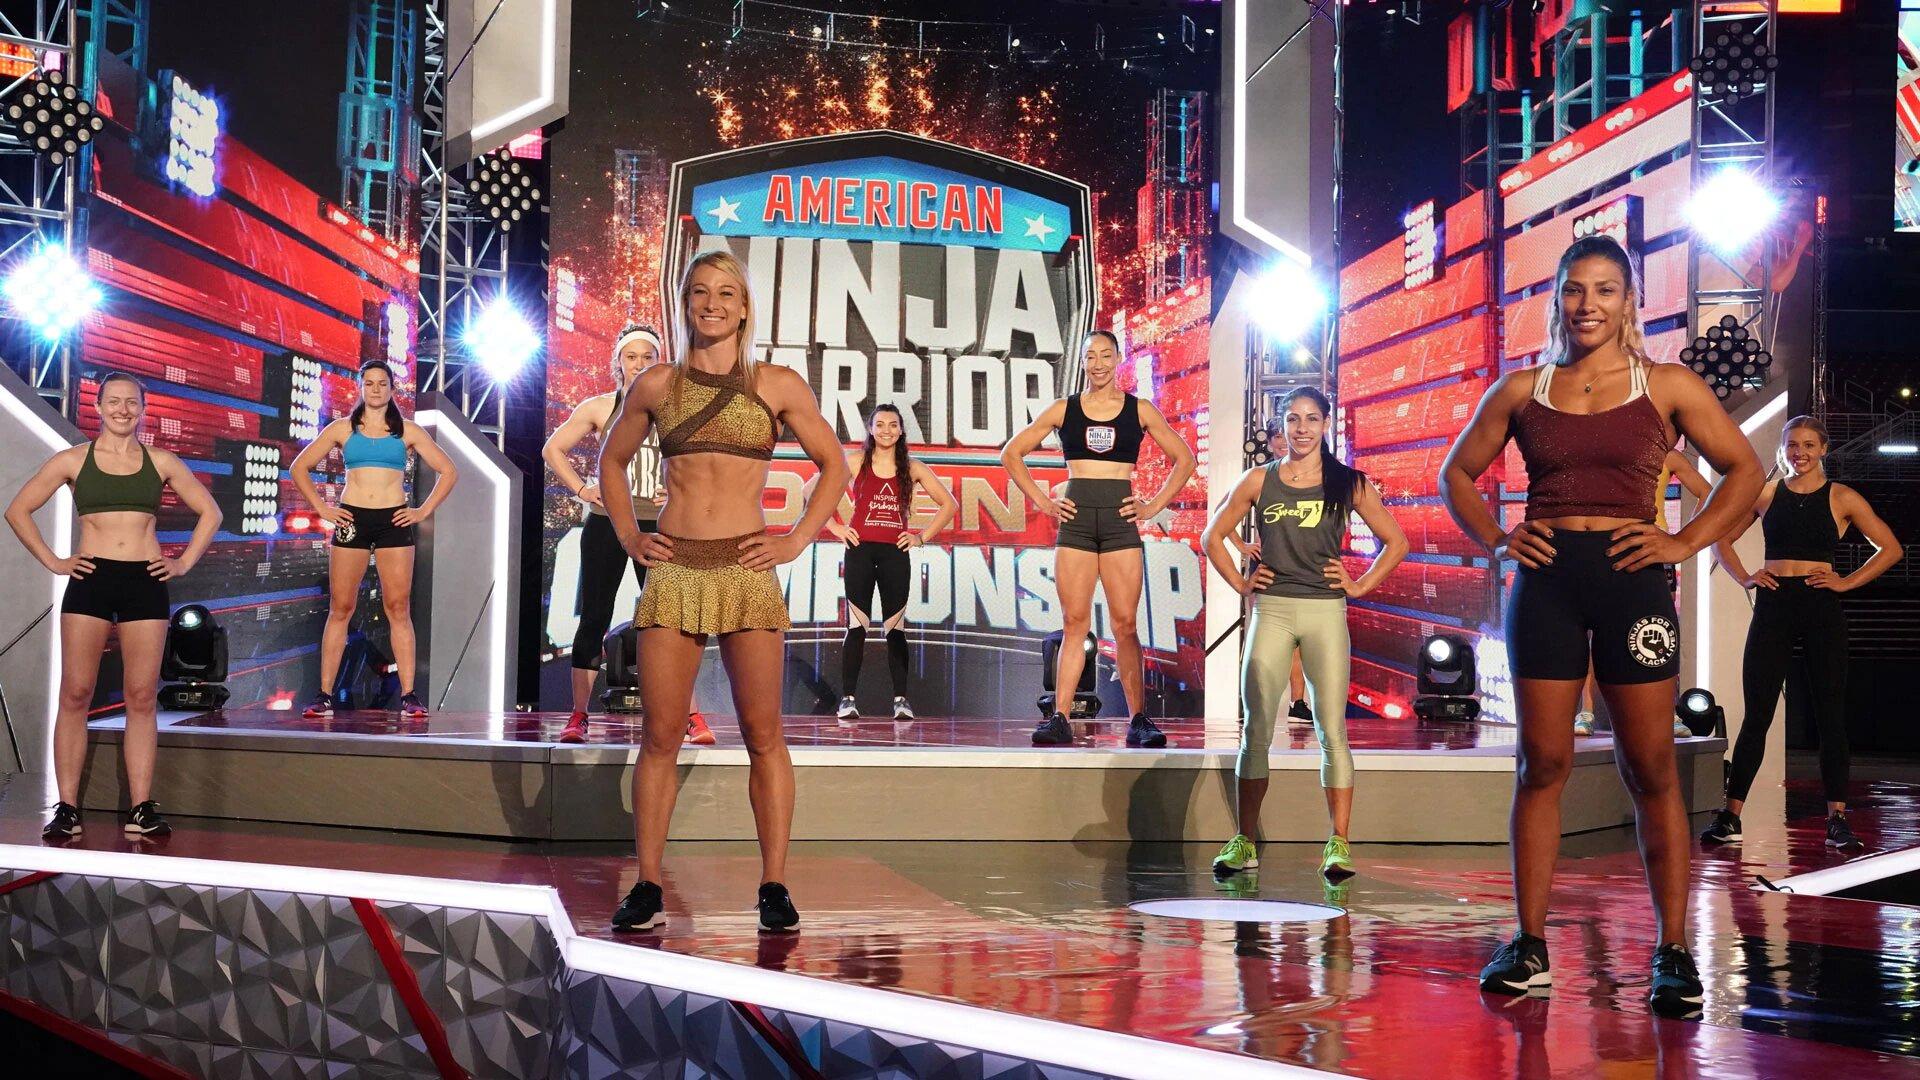 Американский Воин Ниндзя — s13 special-1 — The American Ninja Warrior Women's Championship